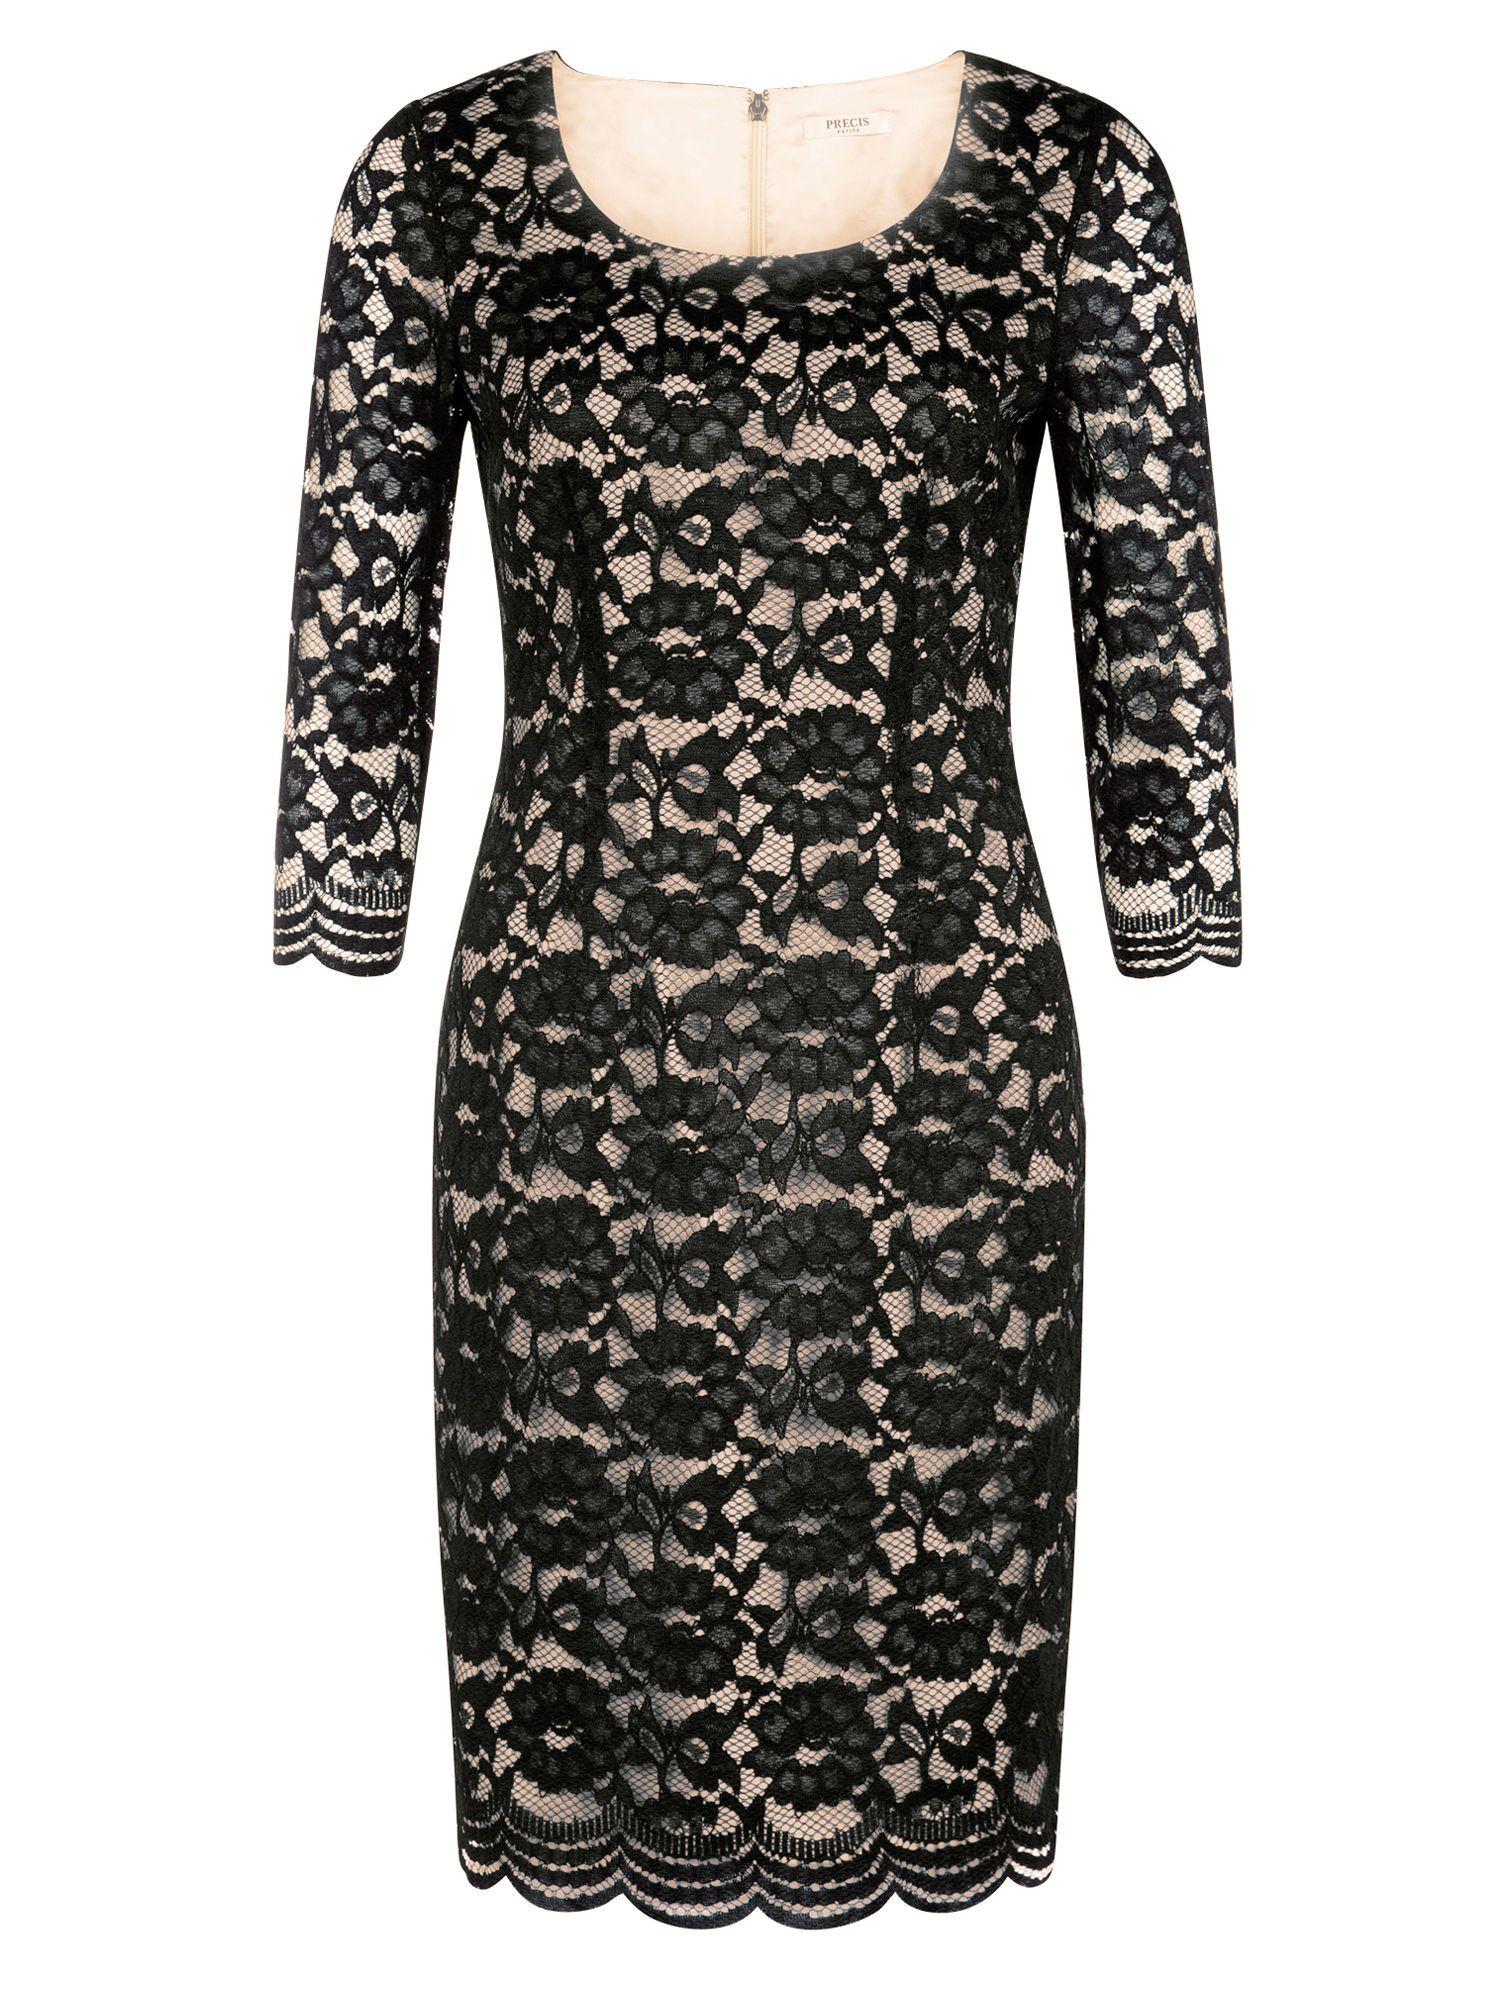 Precis Petite Black Lace Dress